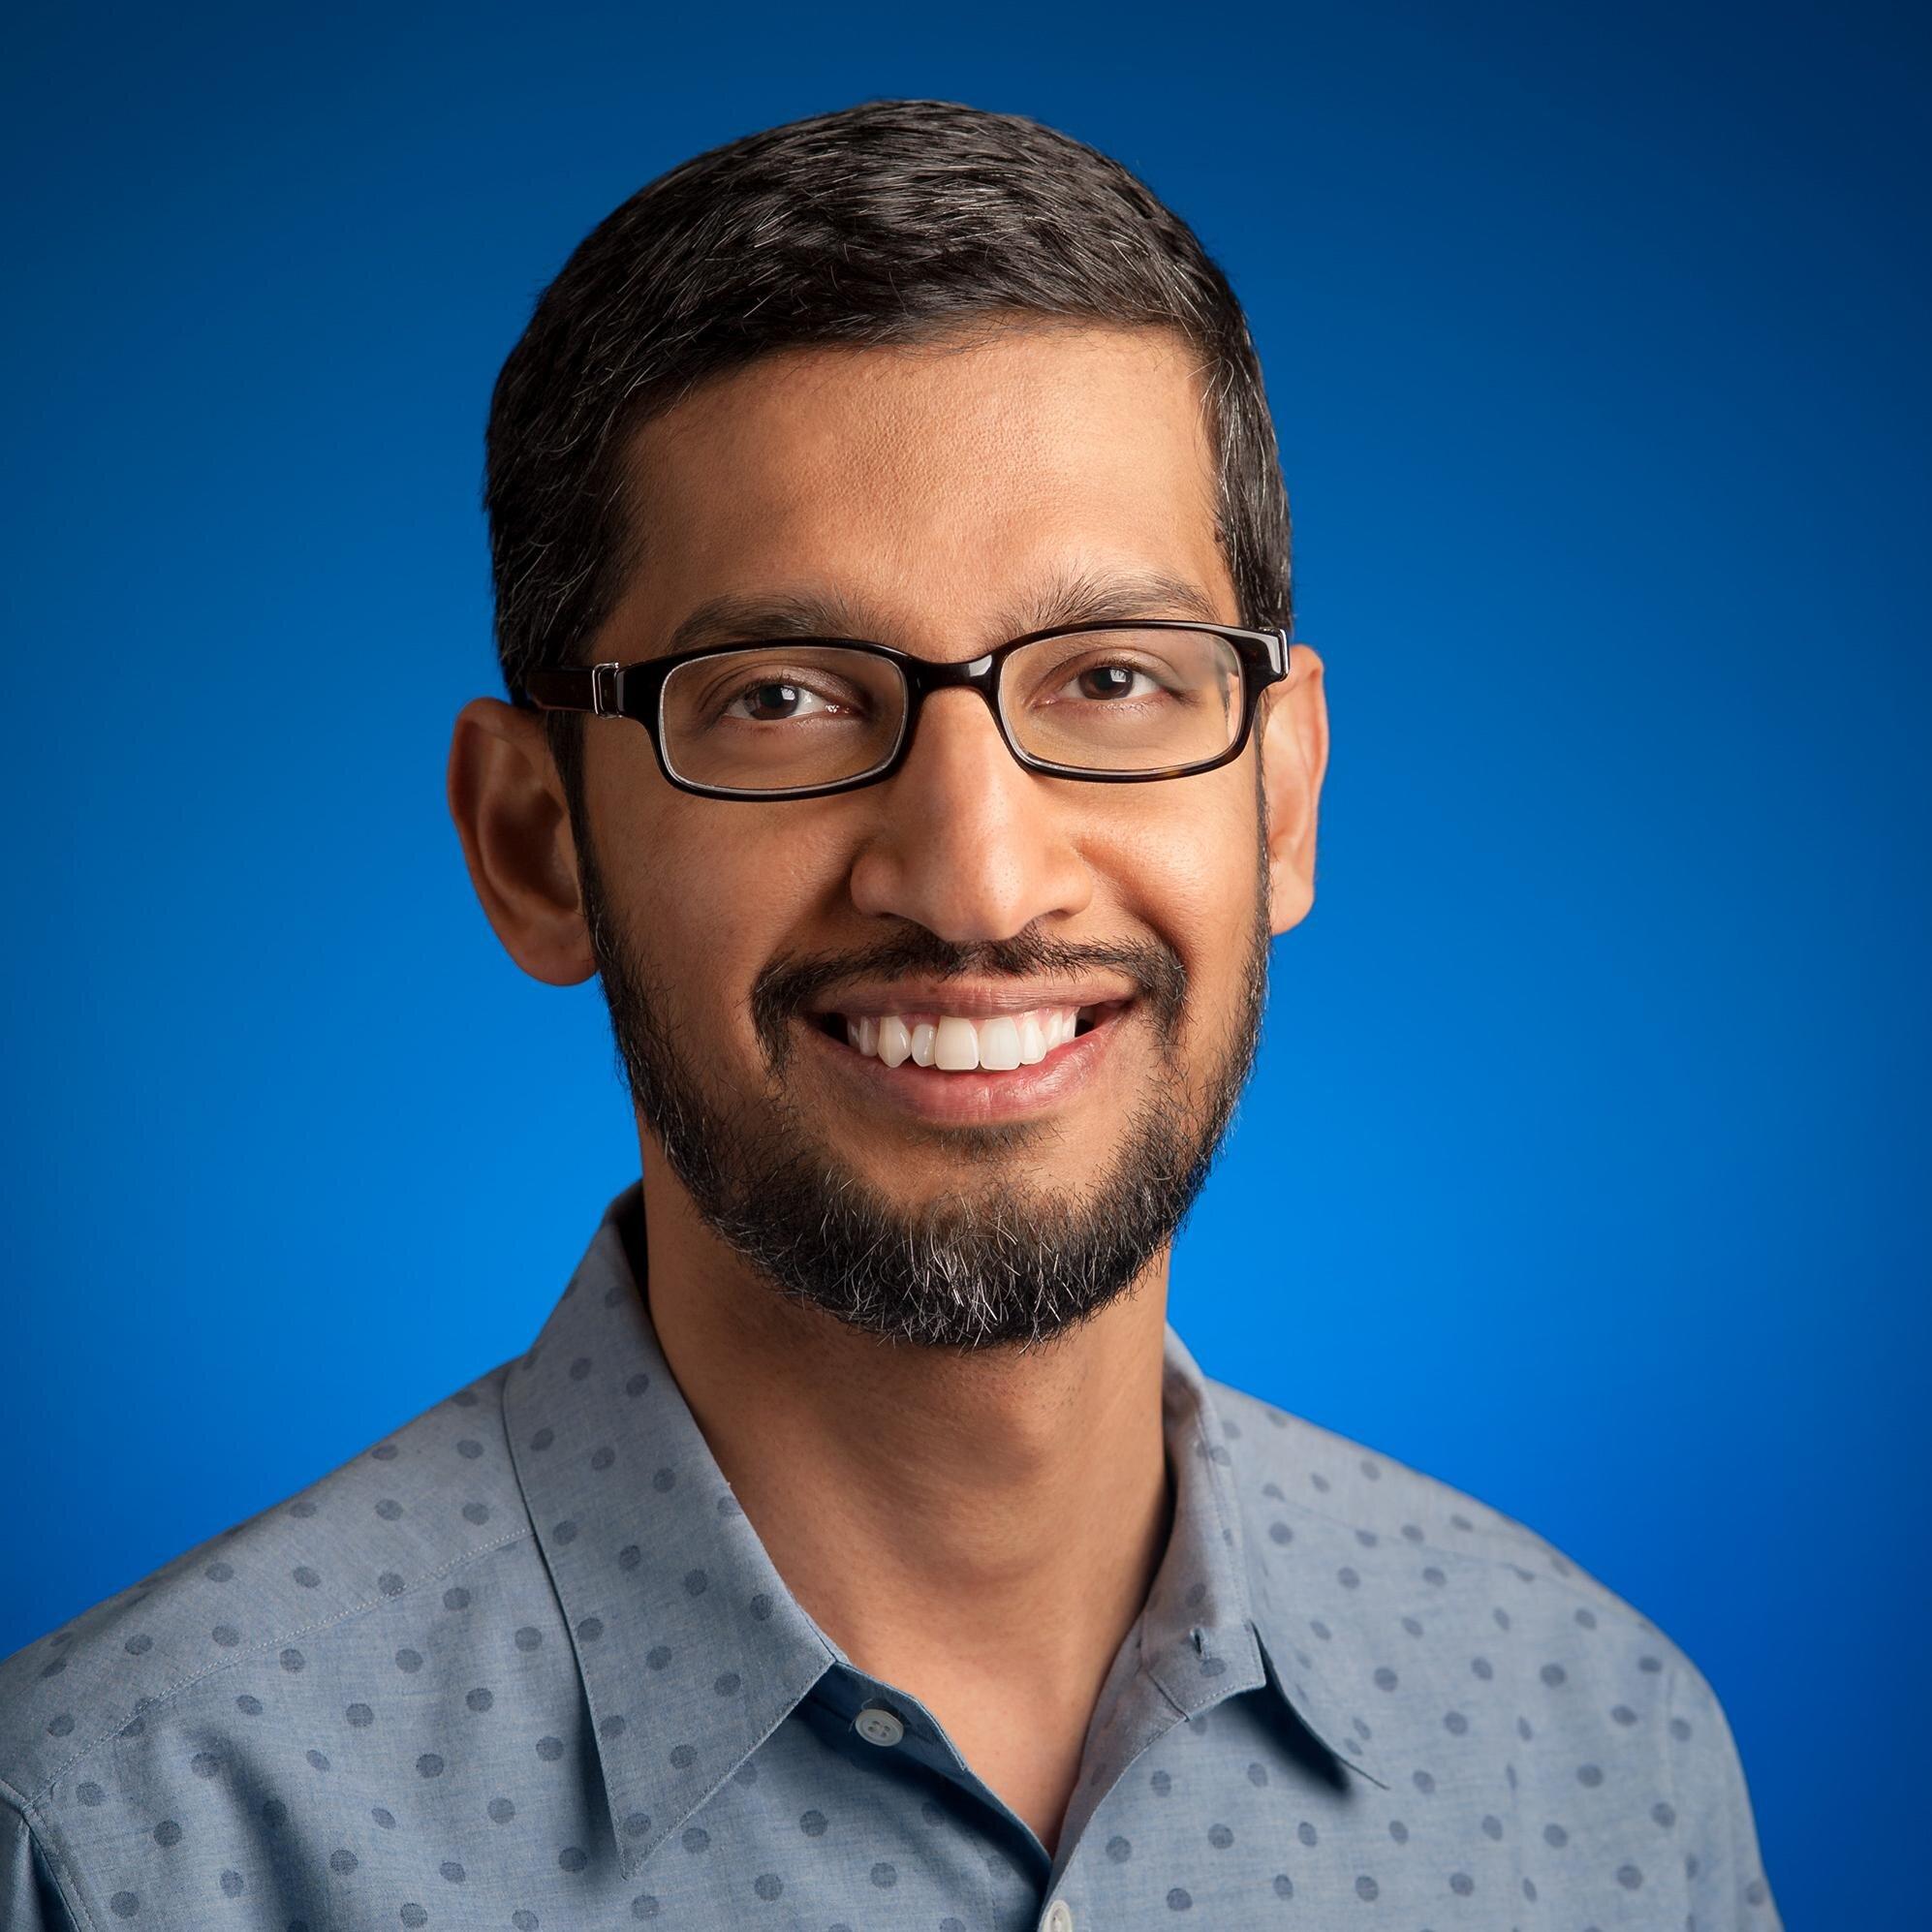 Google's CEO Indian-American Sundar Pichai